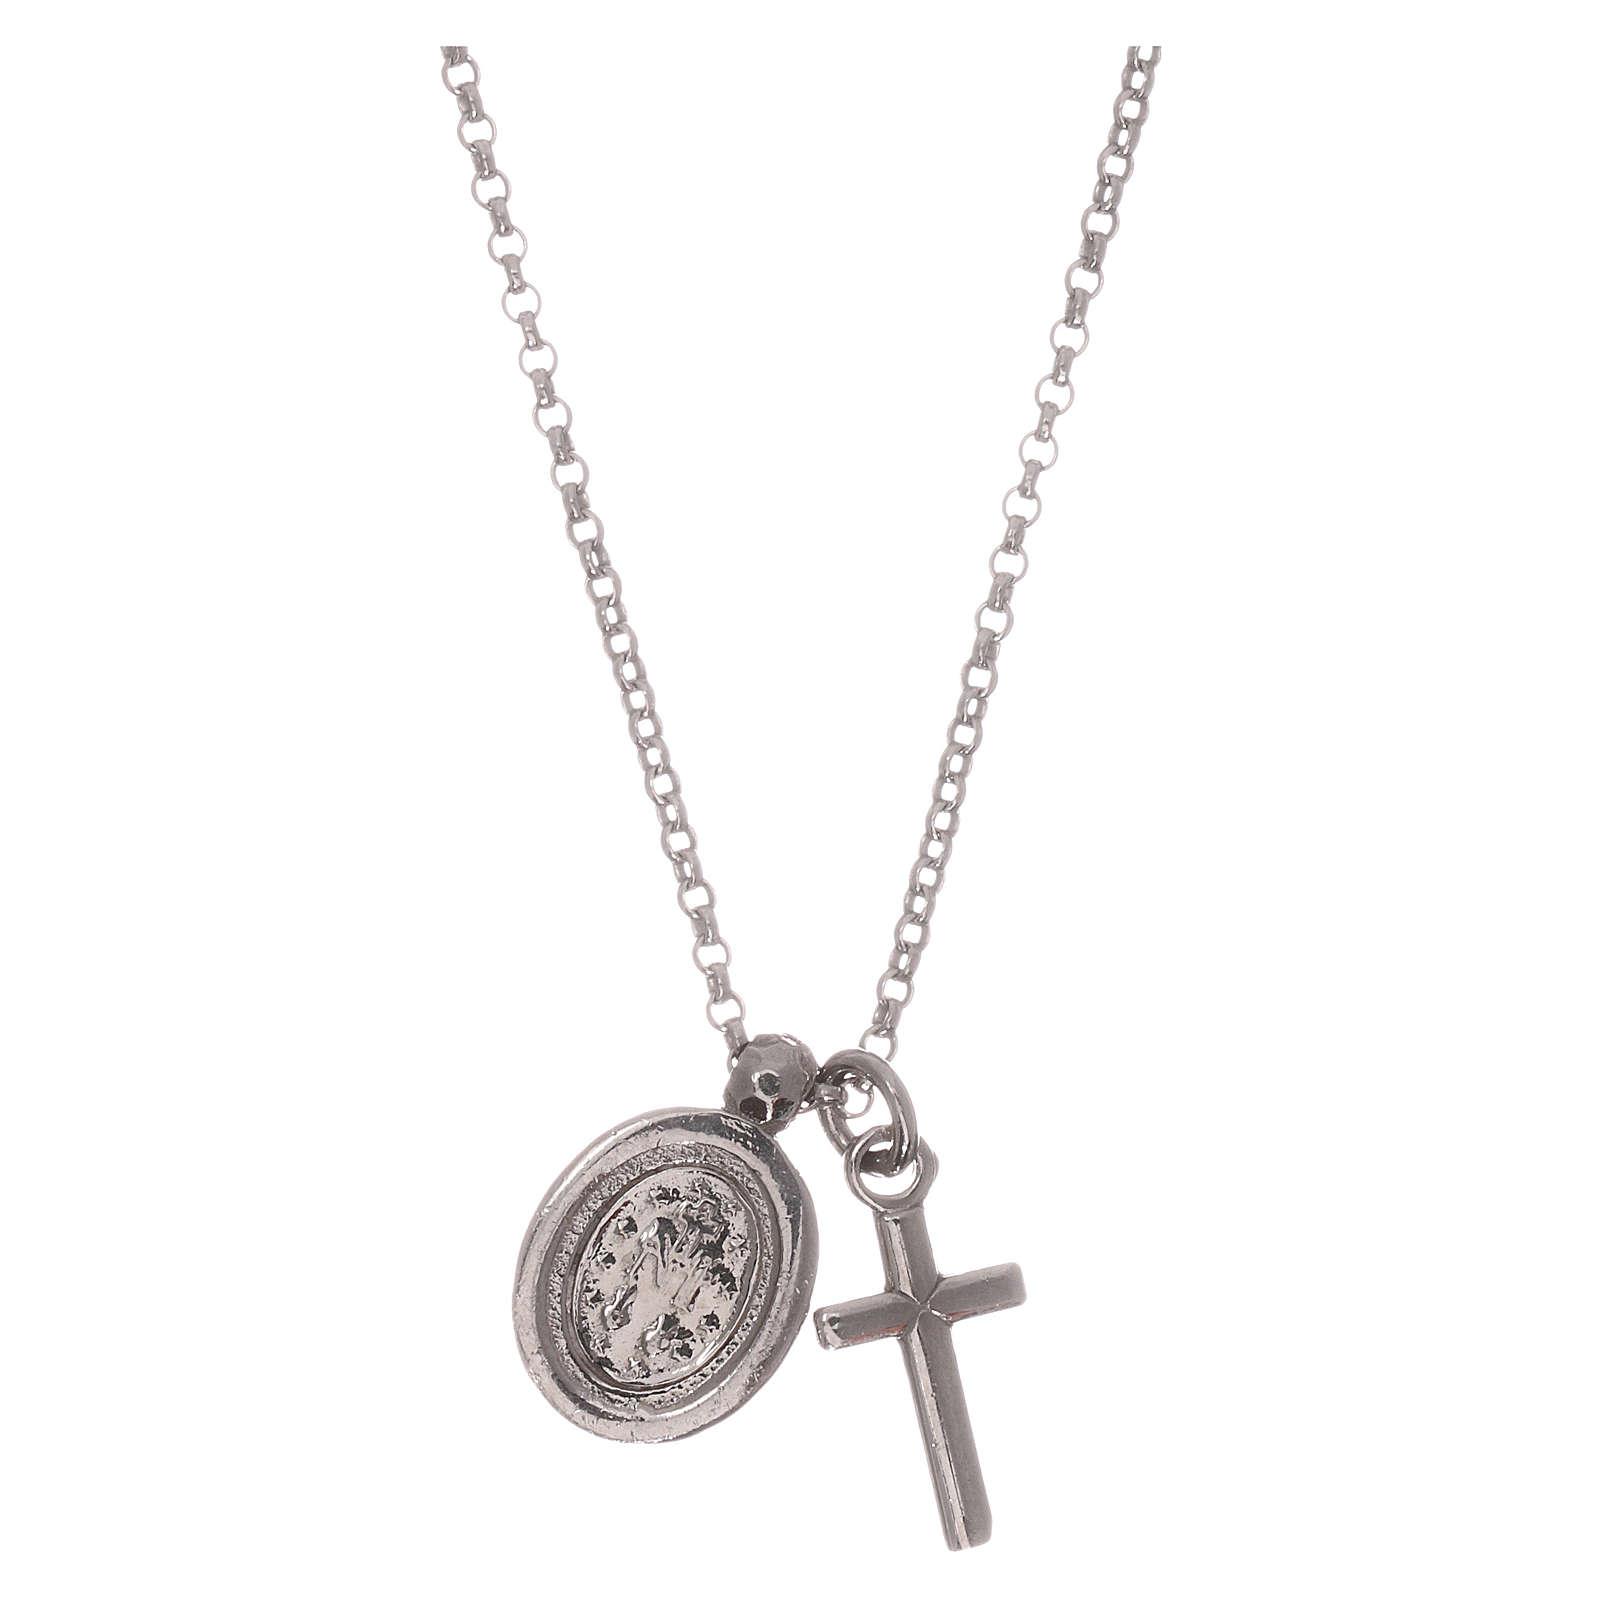 Colar AMEN prata 925 radiada zircões brancos cruz Virgem Milagrosa 4